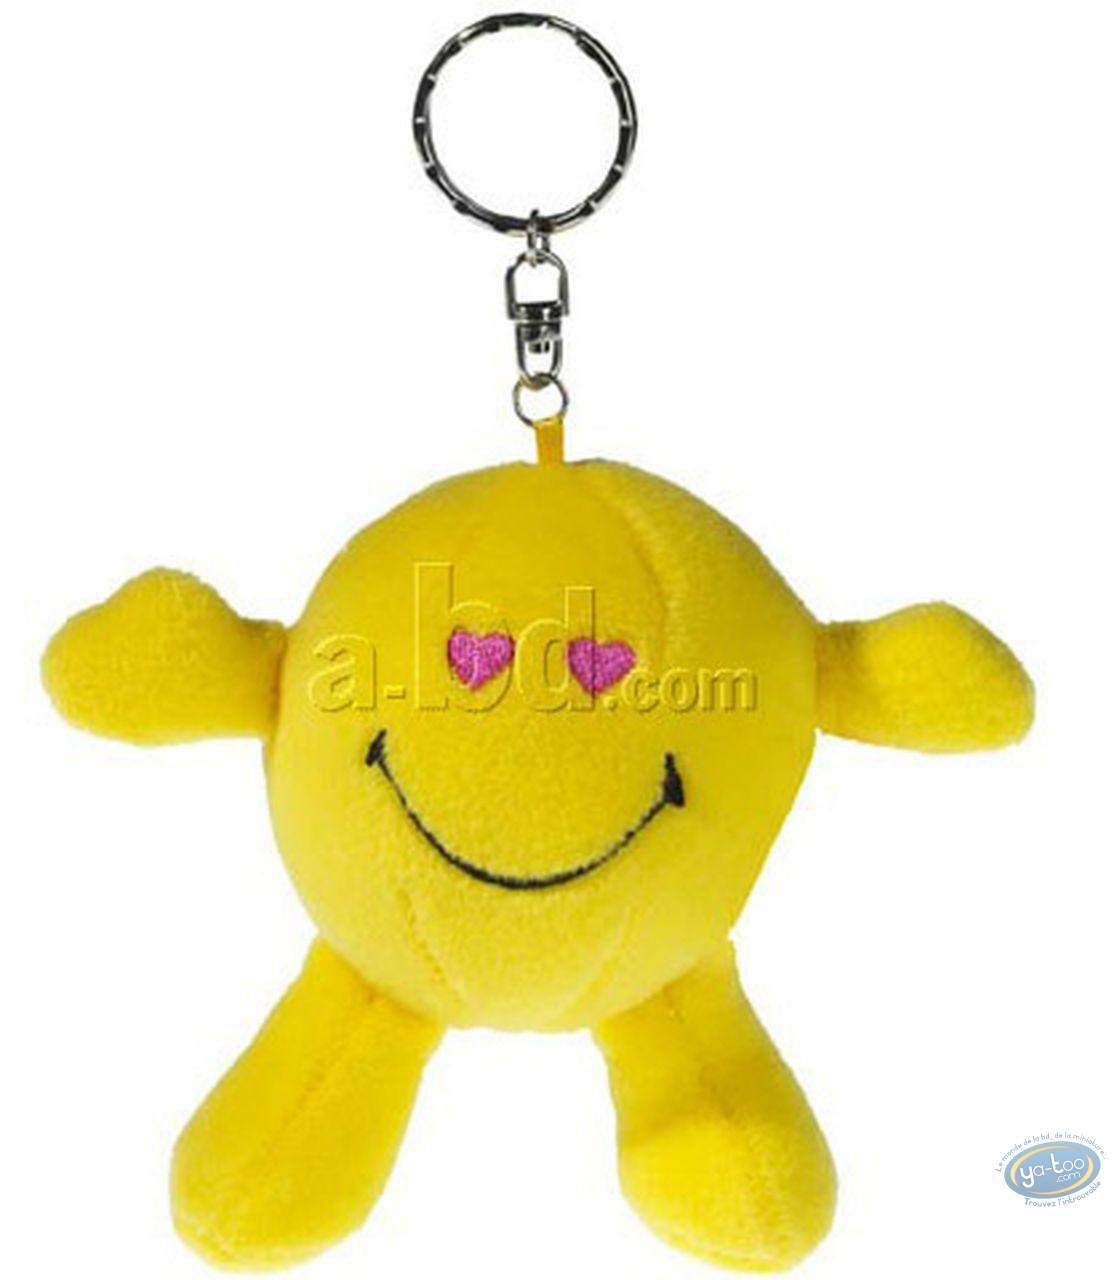 Keyring, Smiley : Plush Key ring, Smiley heart